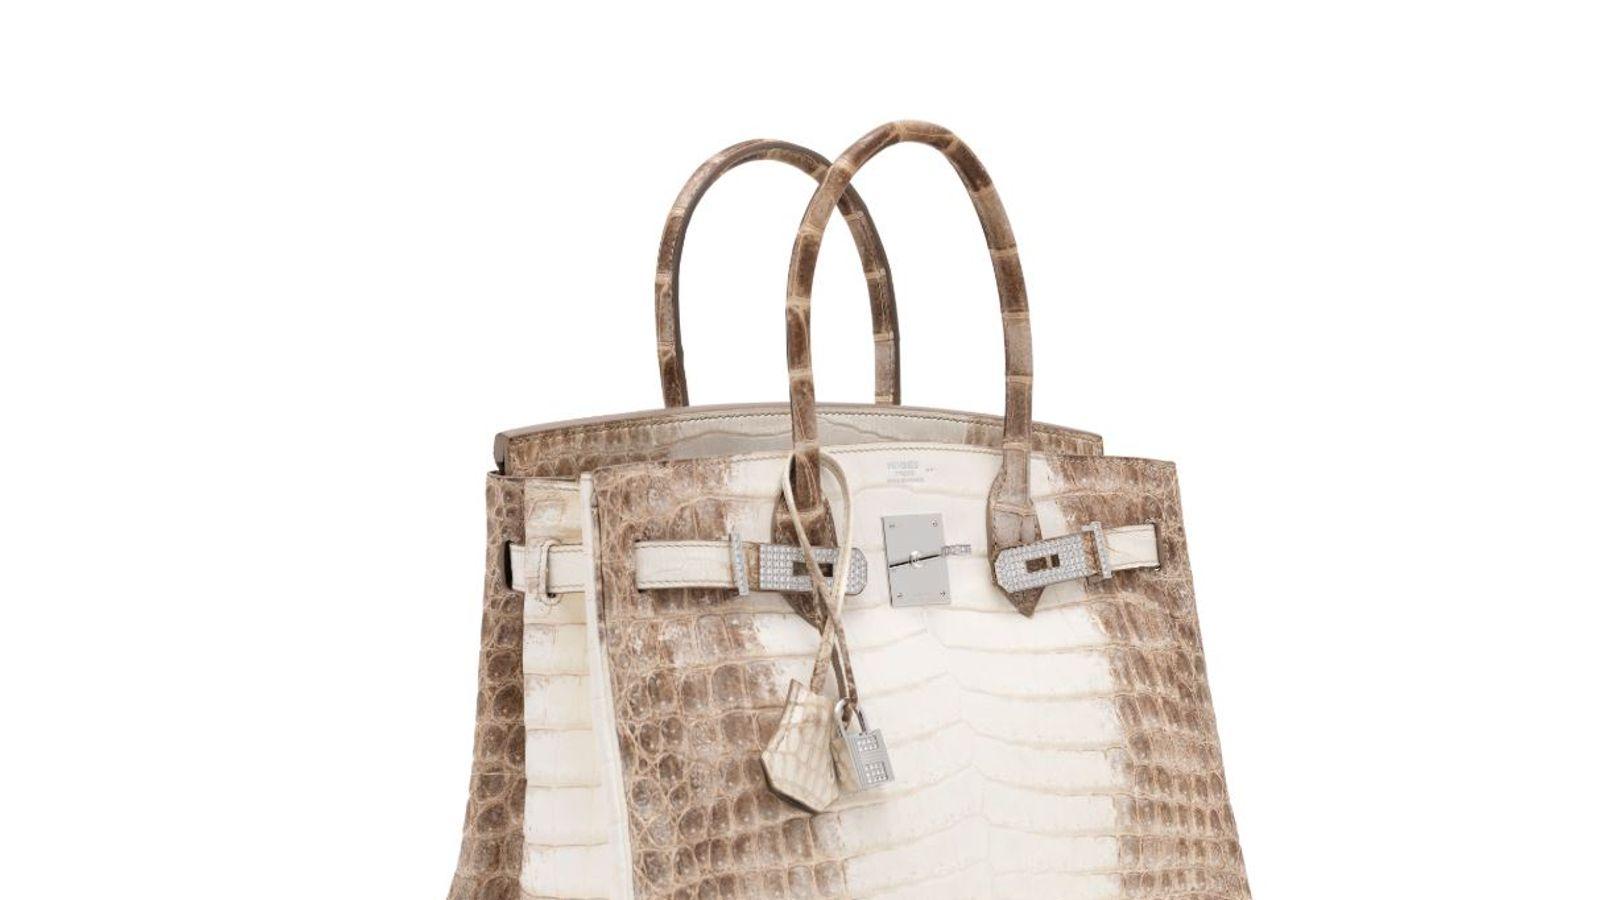 Diamond-encrusted Hermes bag